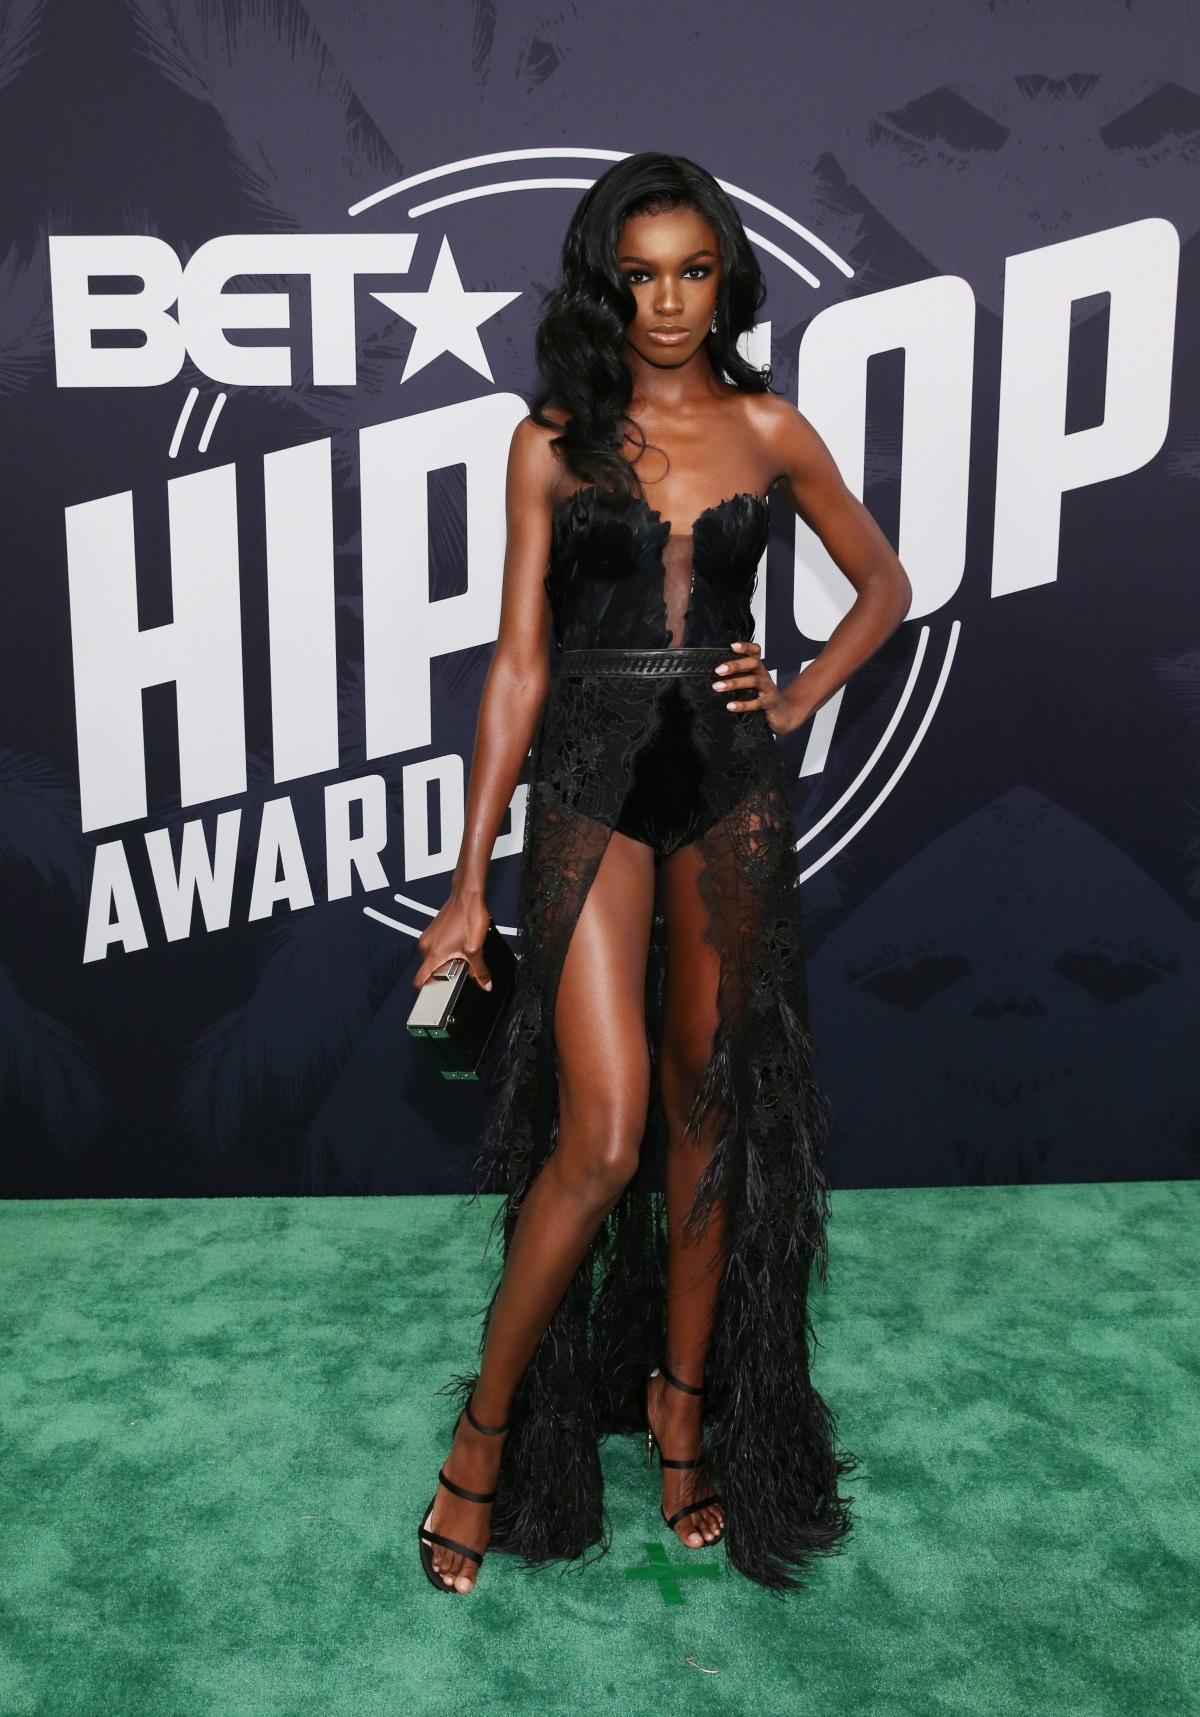 Моделът на бельо Лиоми Андерсън БЕТ хип-хоп наградите в Маями.